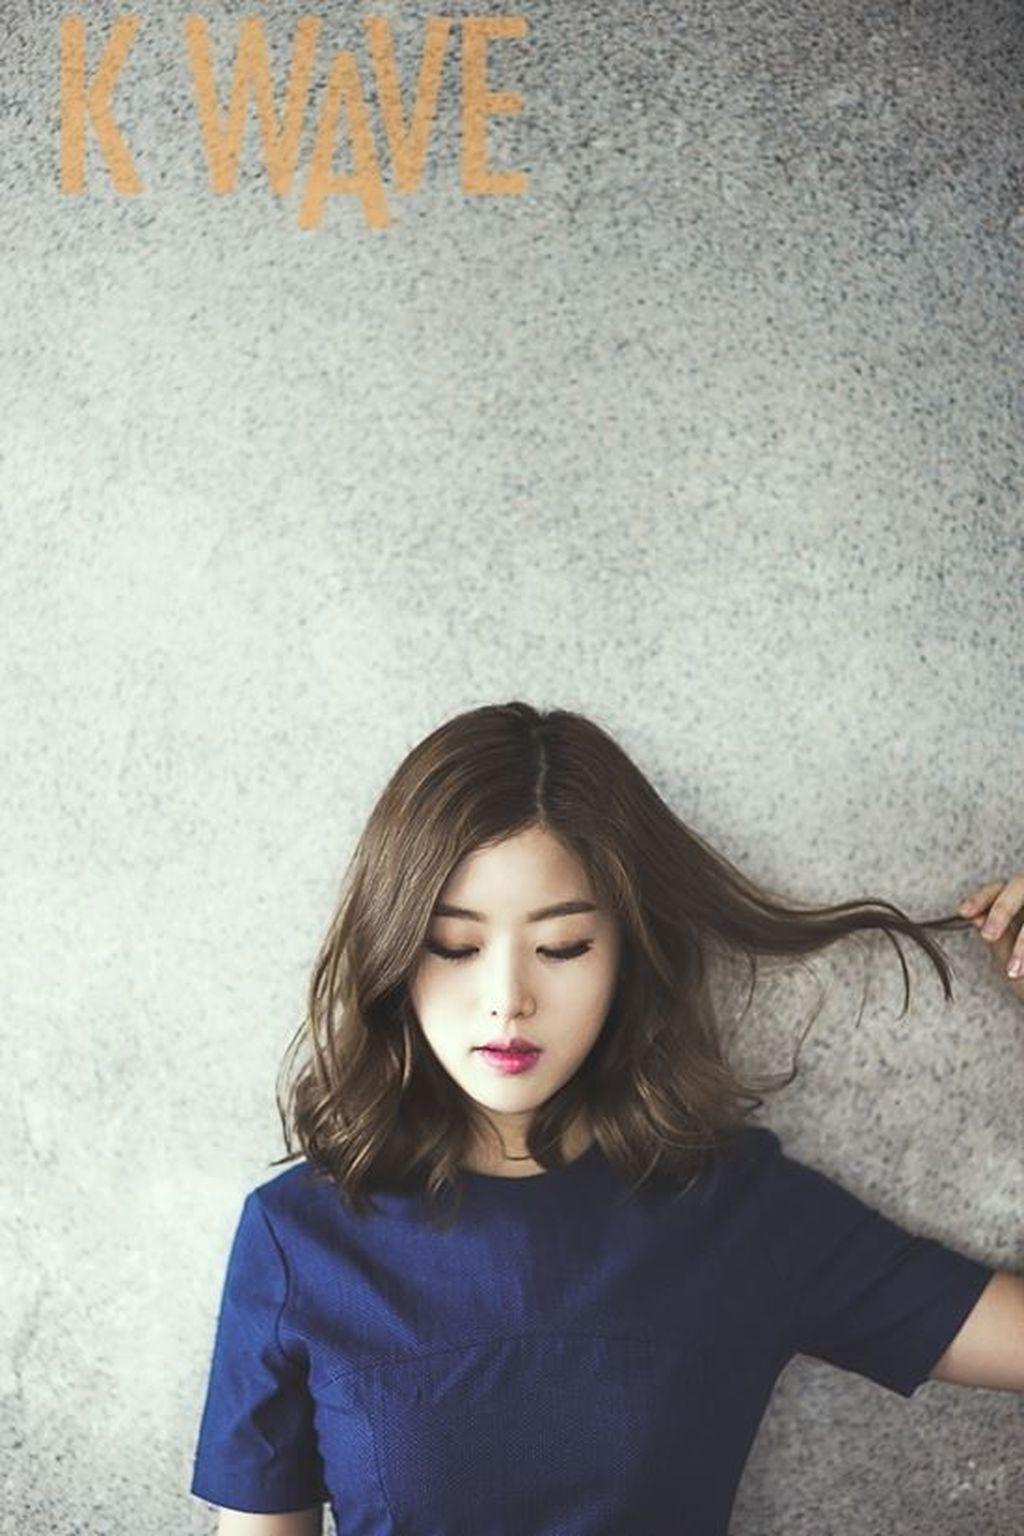 12 Stunning Summer Hairstyles Ideas For Women - ADDICFASHION